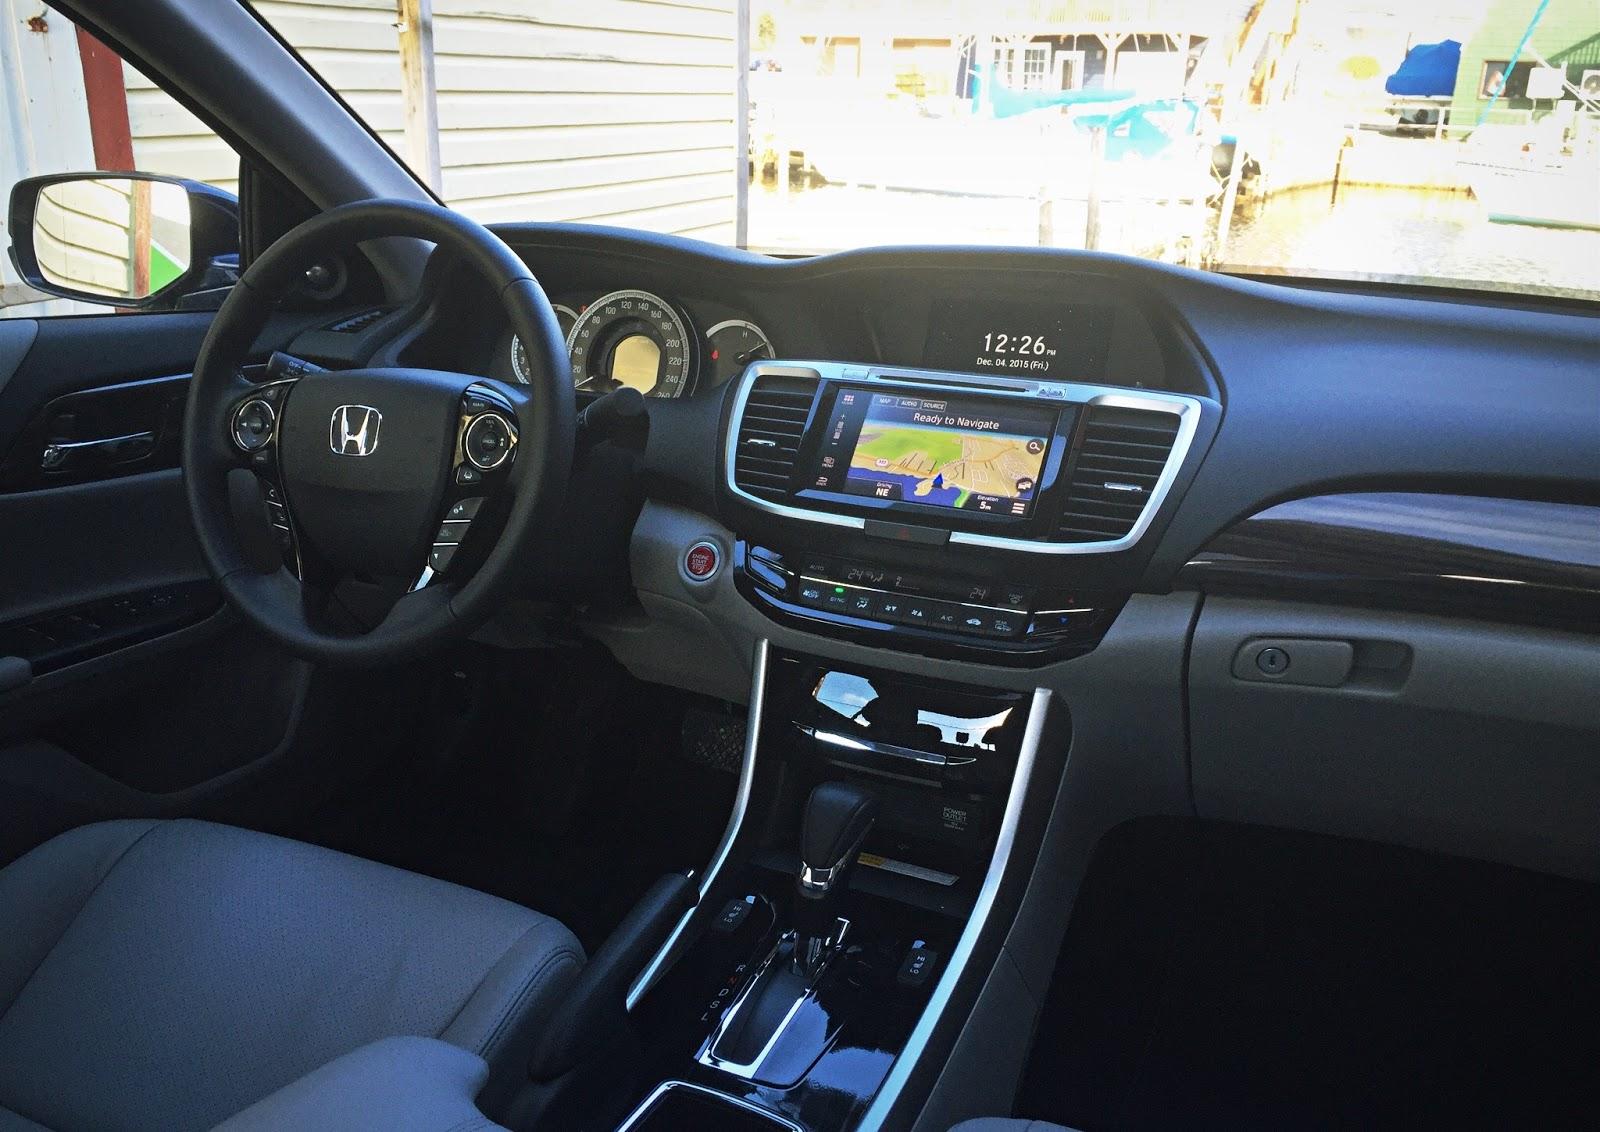 2016 Honda Accord Touring Review – GCBC's Favourite Midsize Car | GCBC